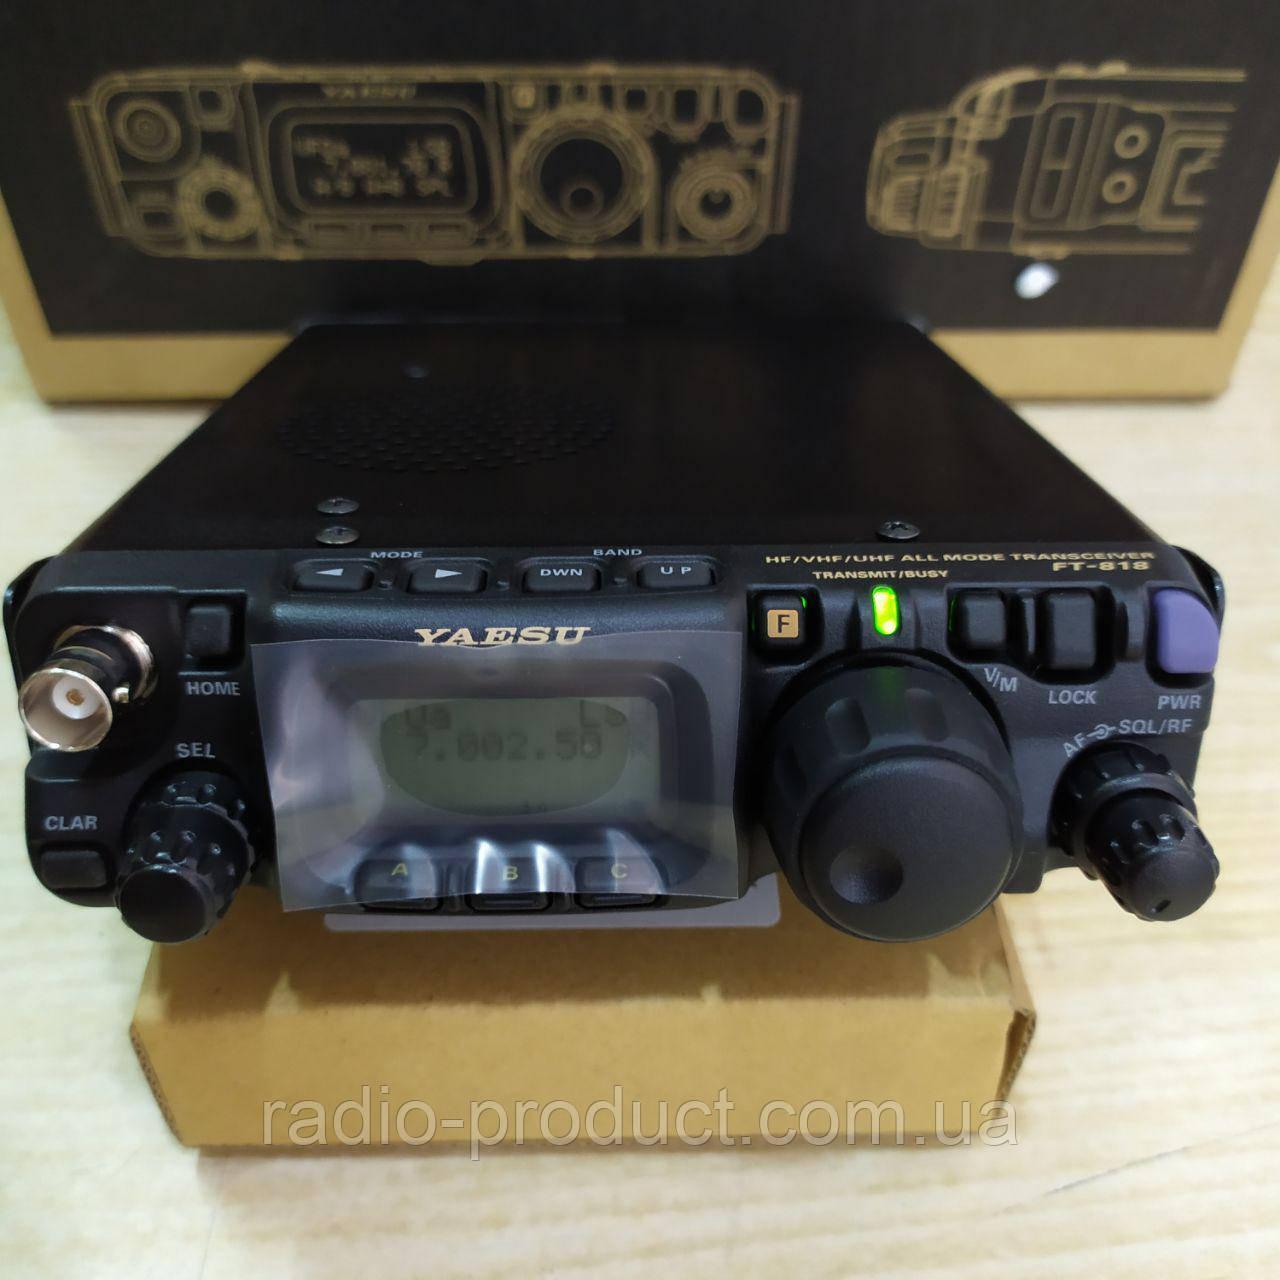 Yaesu FT-818ND, КВ + УКВ трансивер, радиостанция, фото 1